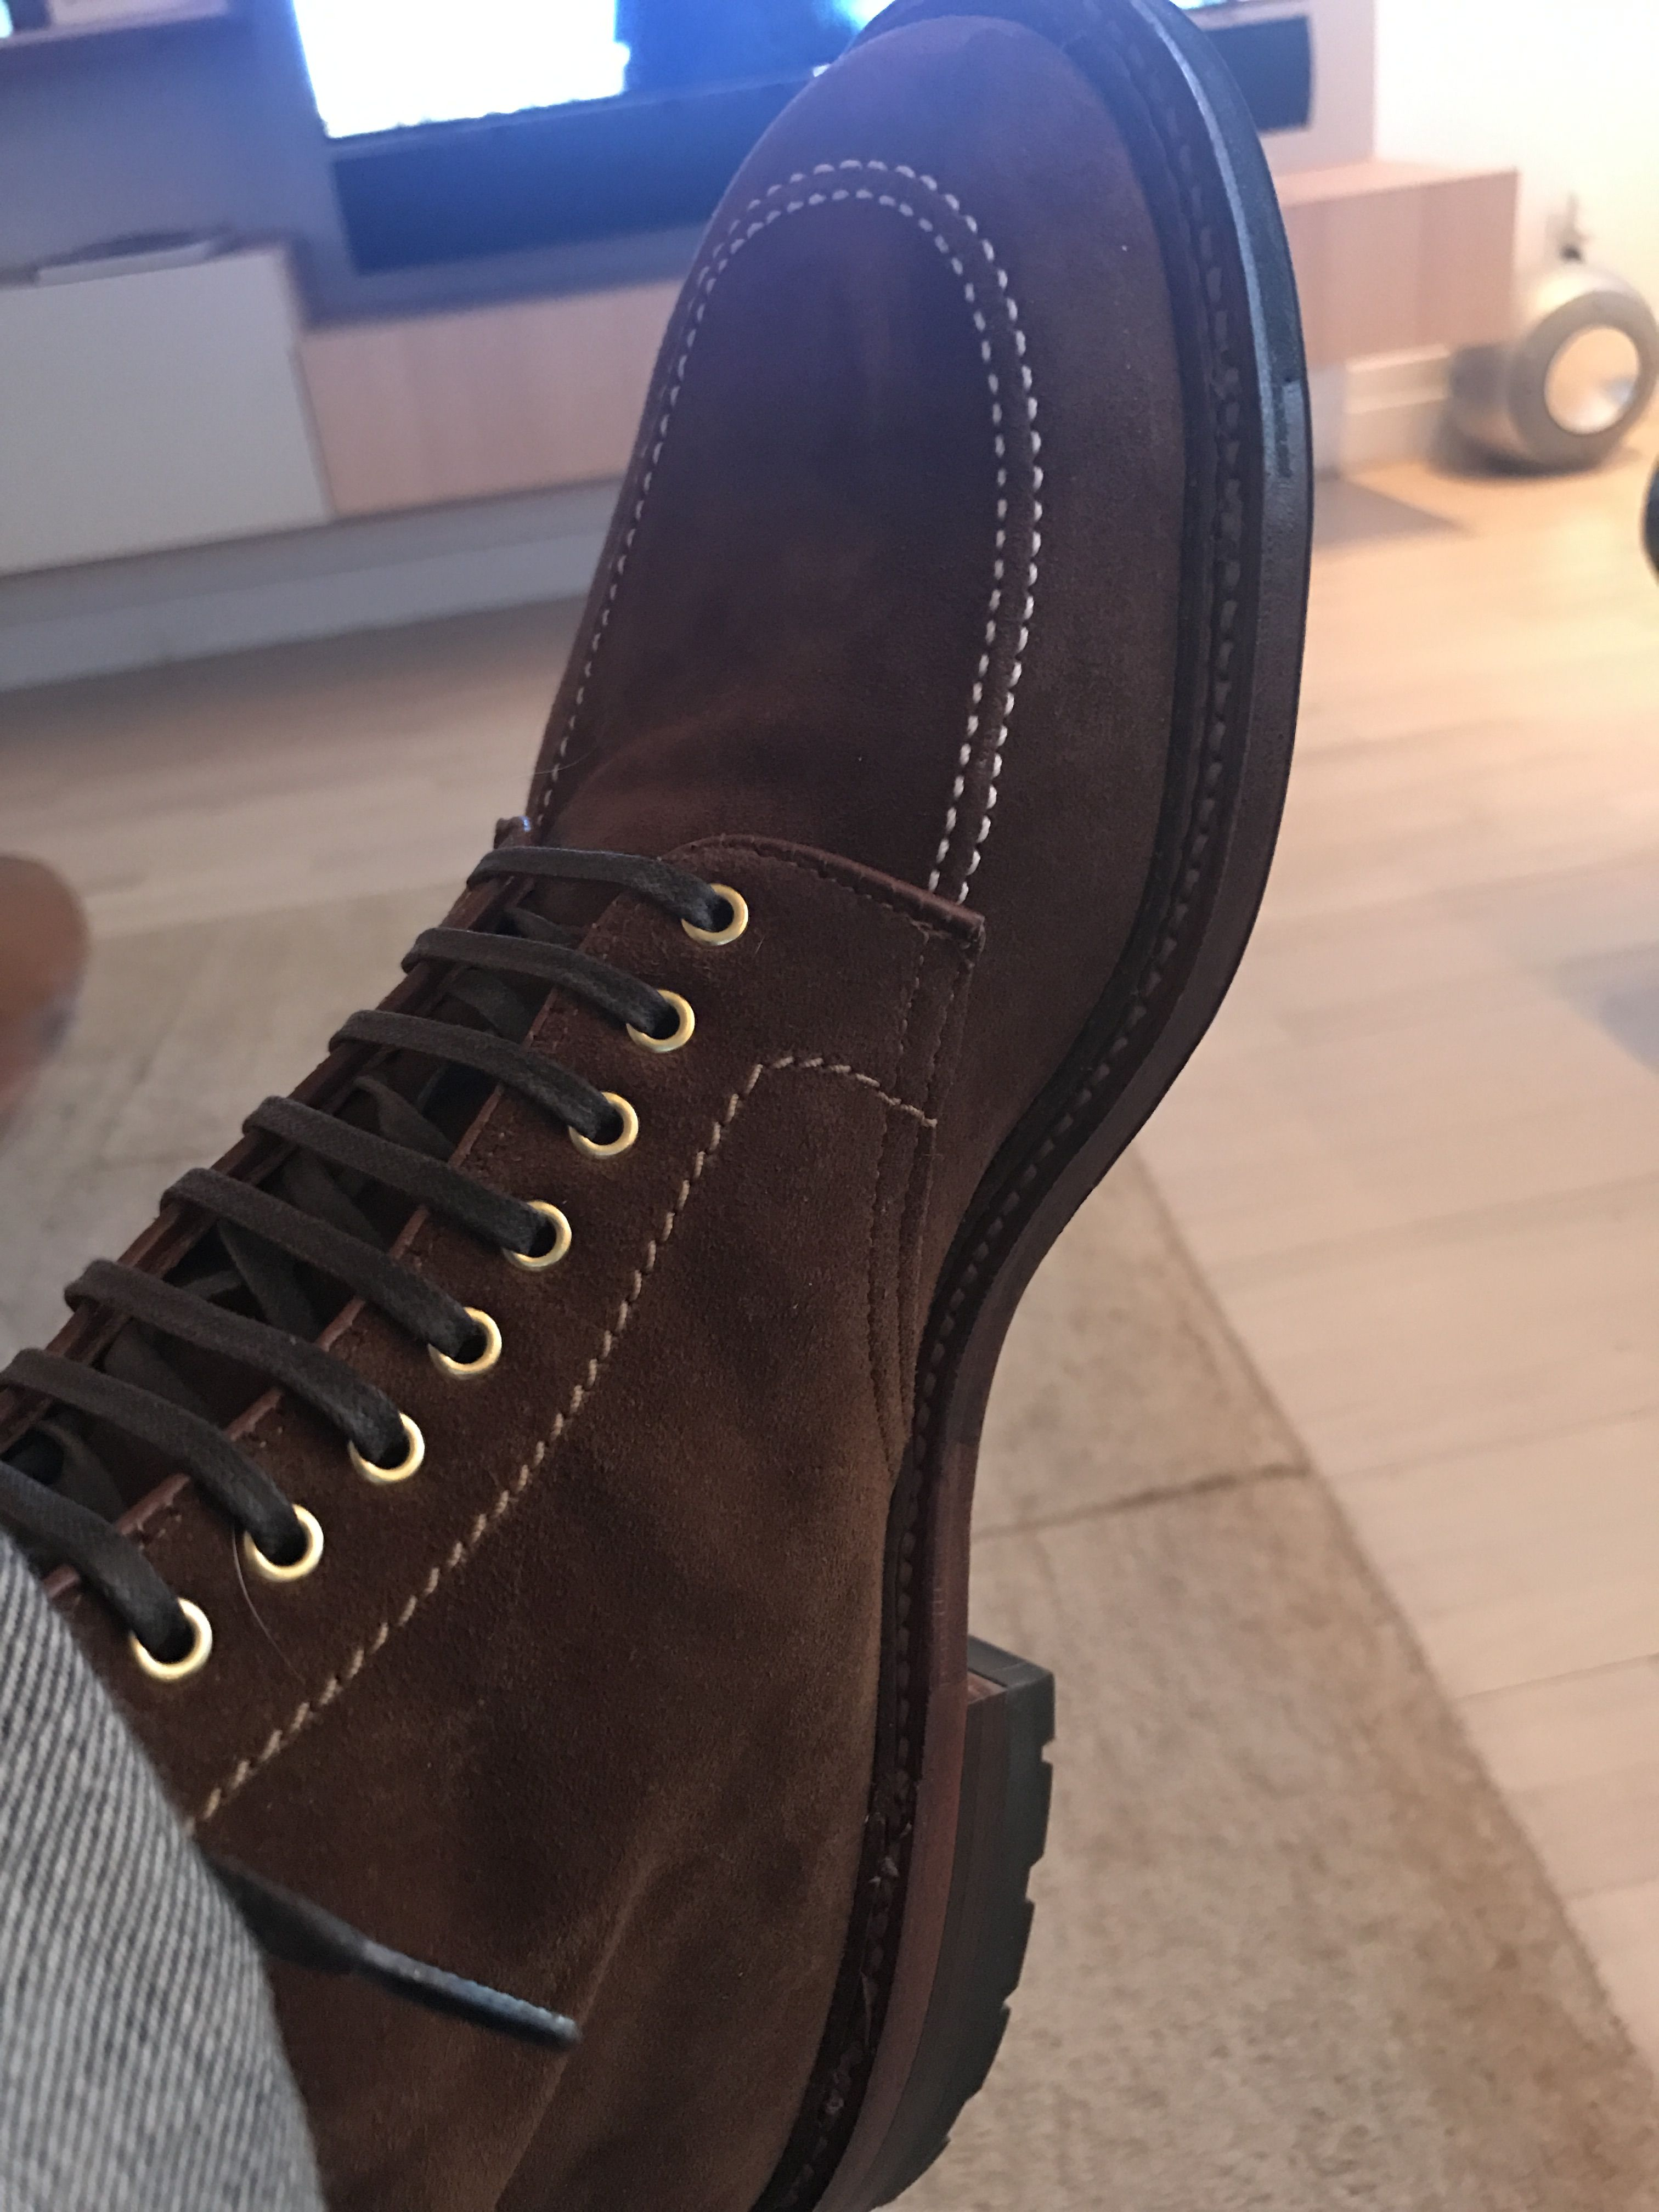 Roughout Indys (Personal pair) Dress shoes men, Oxford